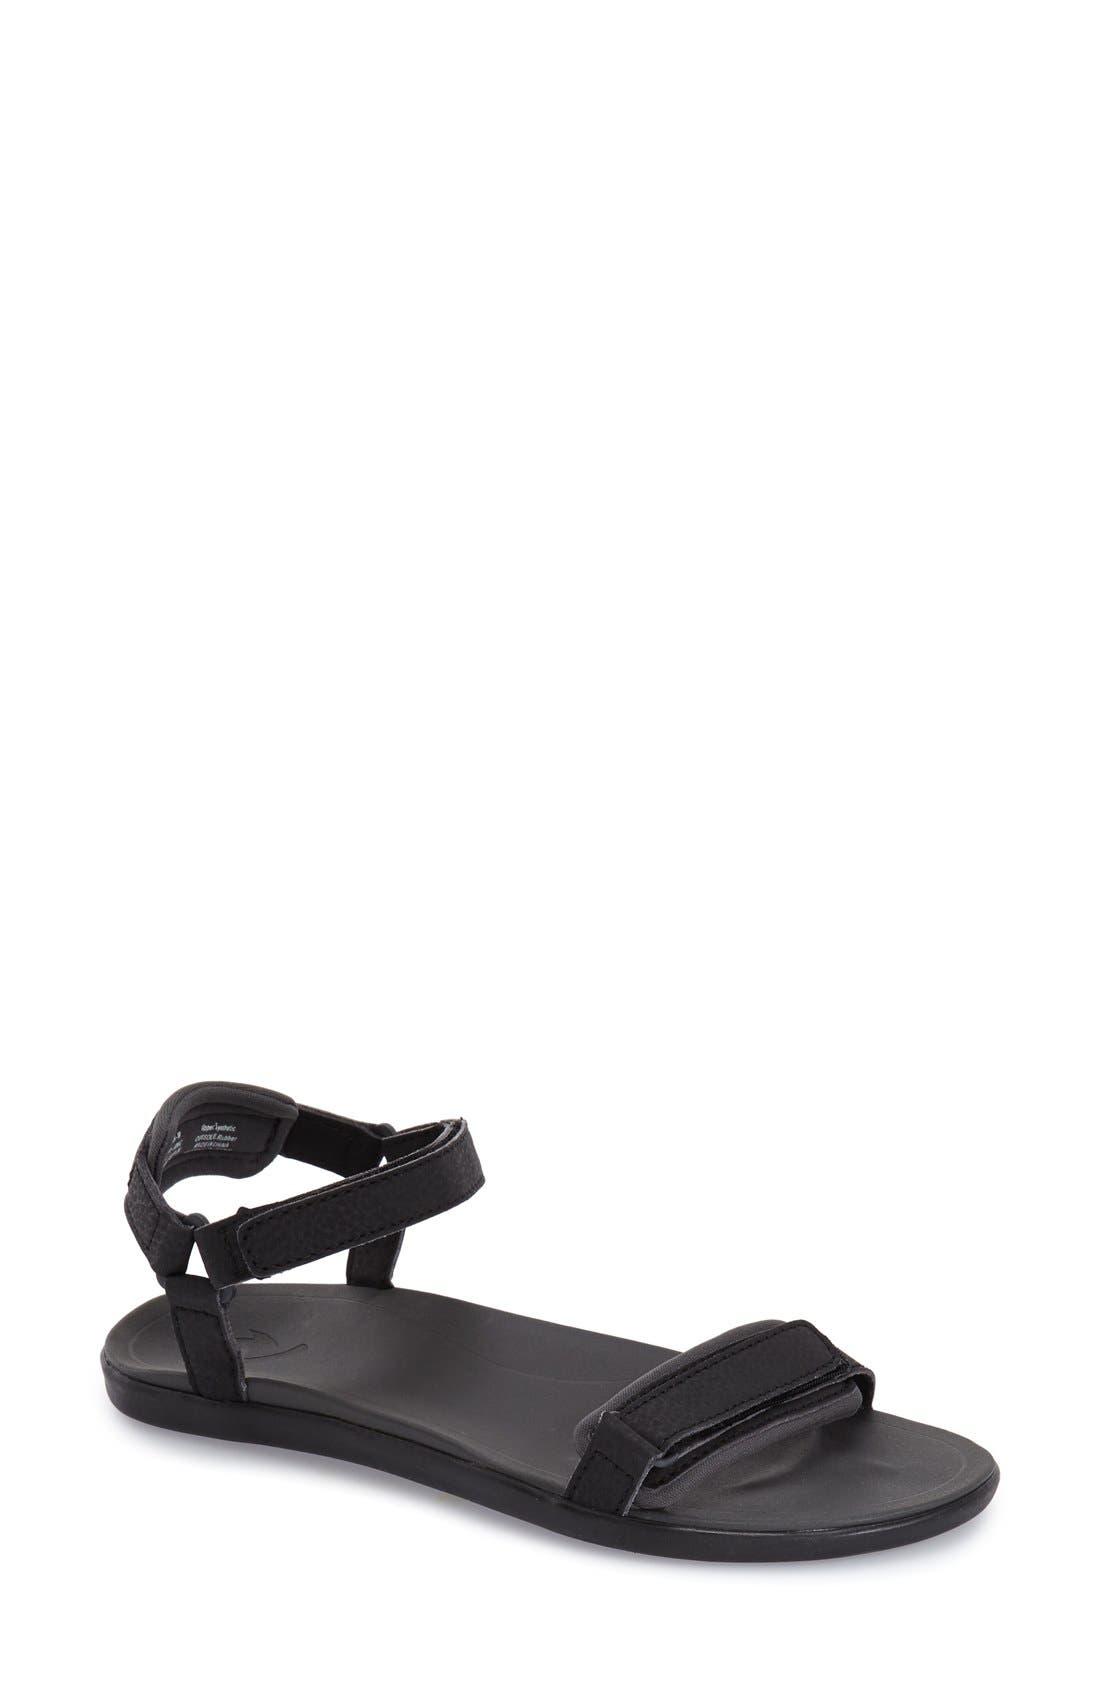 Main Image - OluKai 'Luana' Sandal (Women). Black Faux Leather swatch image  White ...